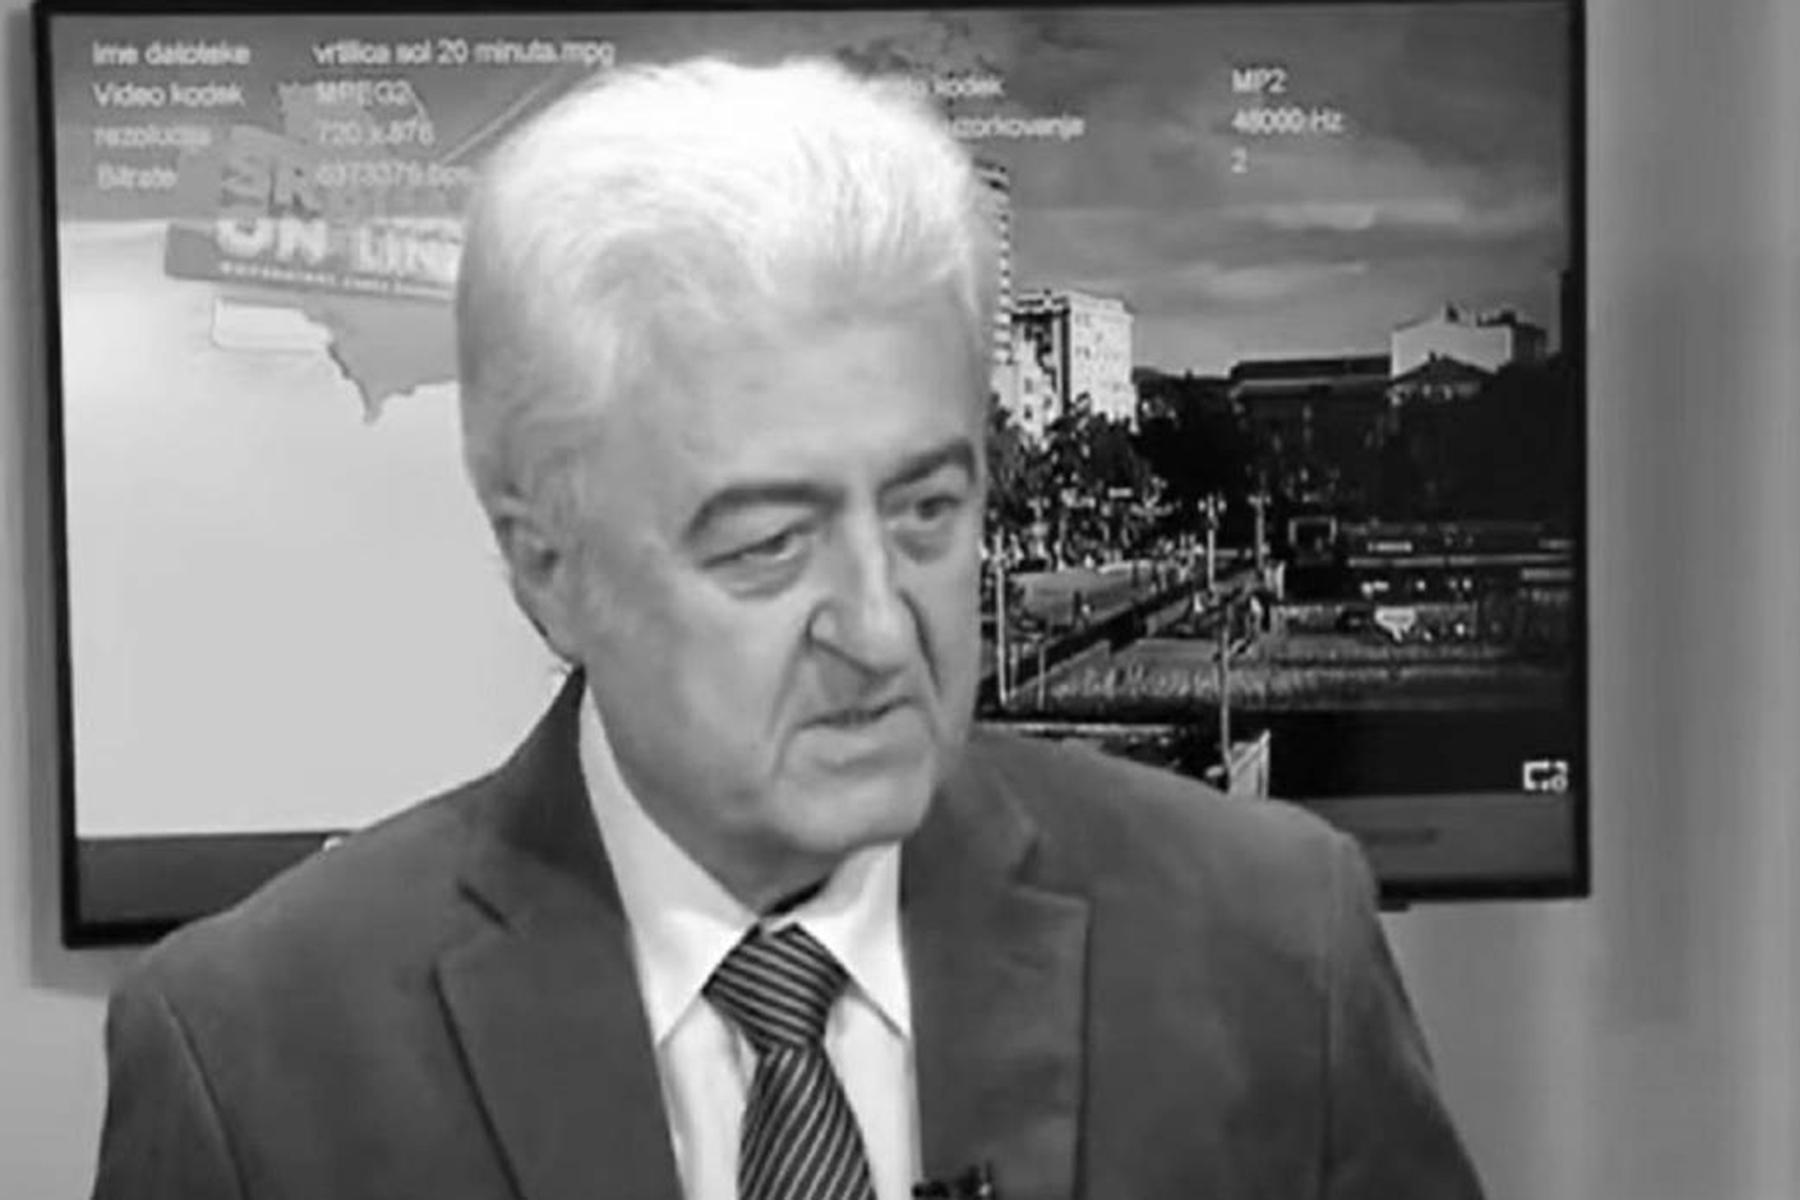 Milorad Mitković